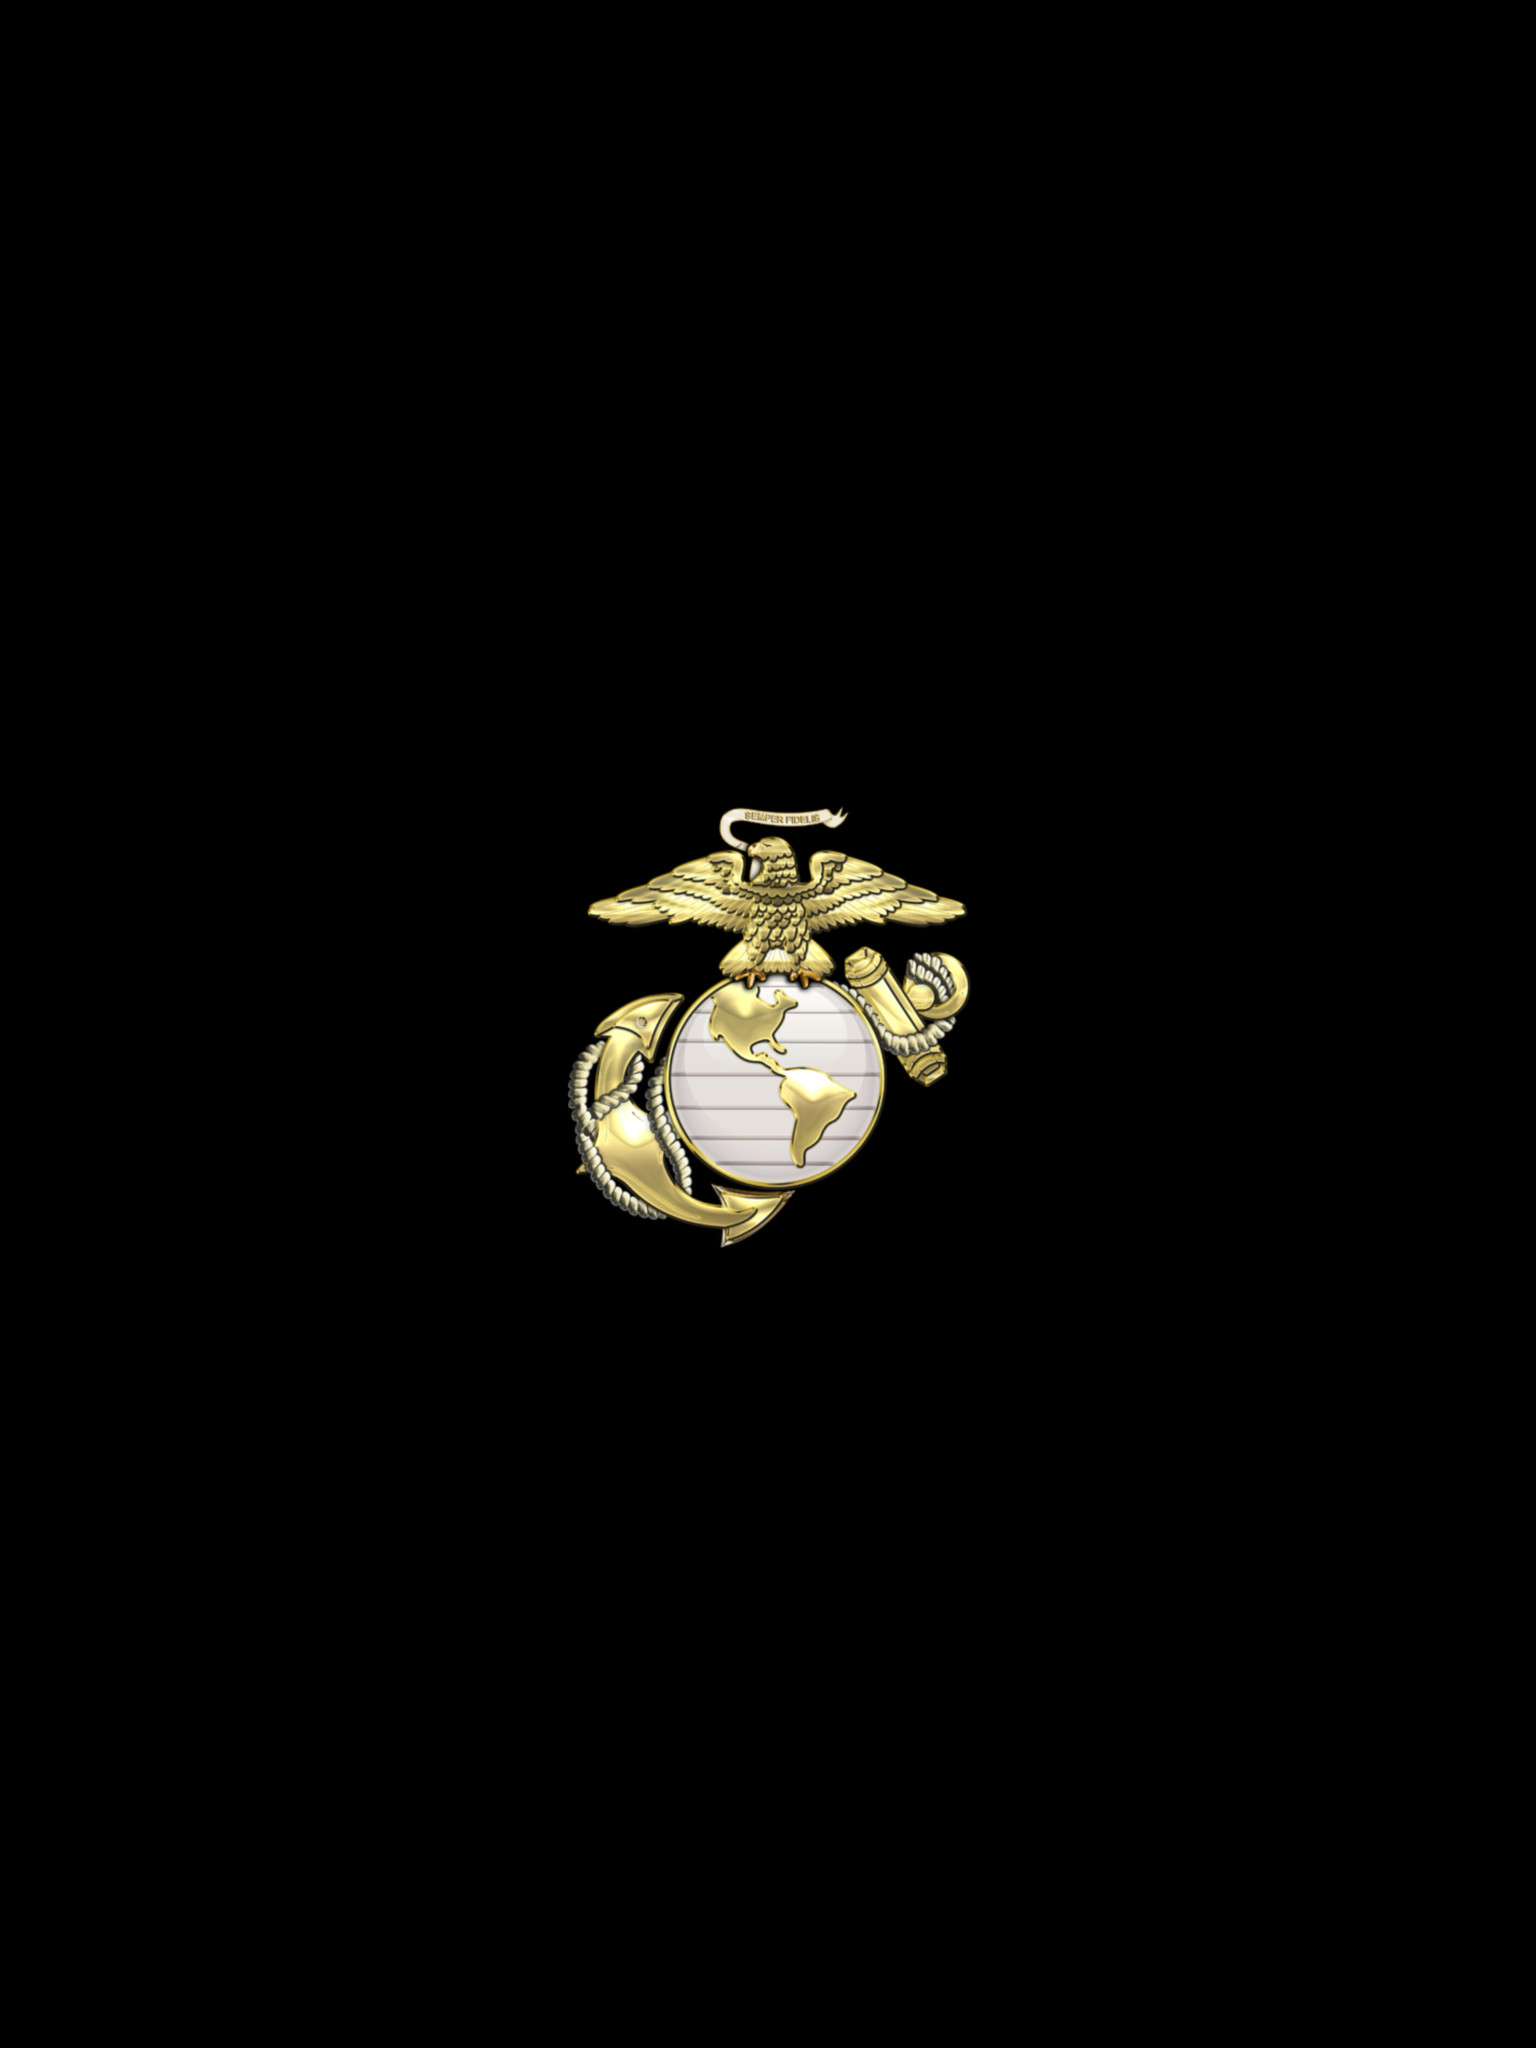 USMC IPAD WALLPAPER